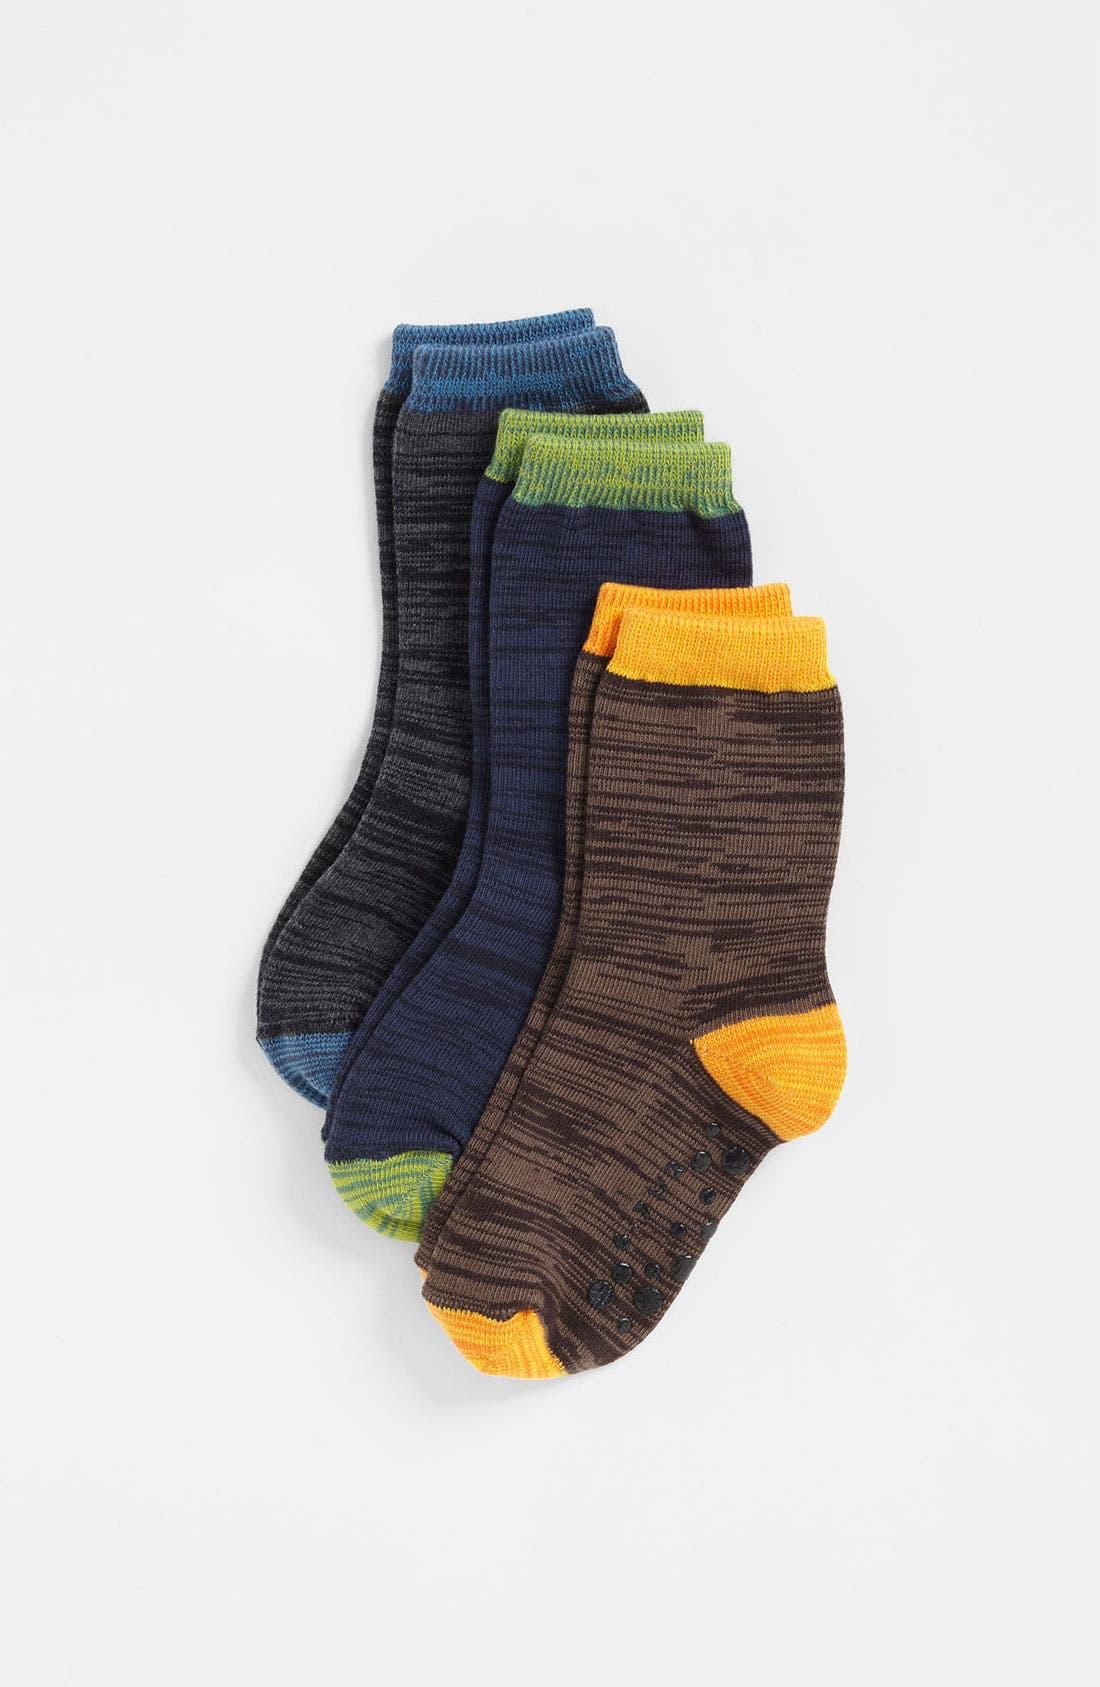 Alternate Image 1 Selected - Nordstrom 'Happy Space' Crew Socks (3-Pack) (Toddler & Little Boys)